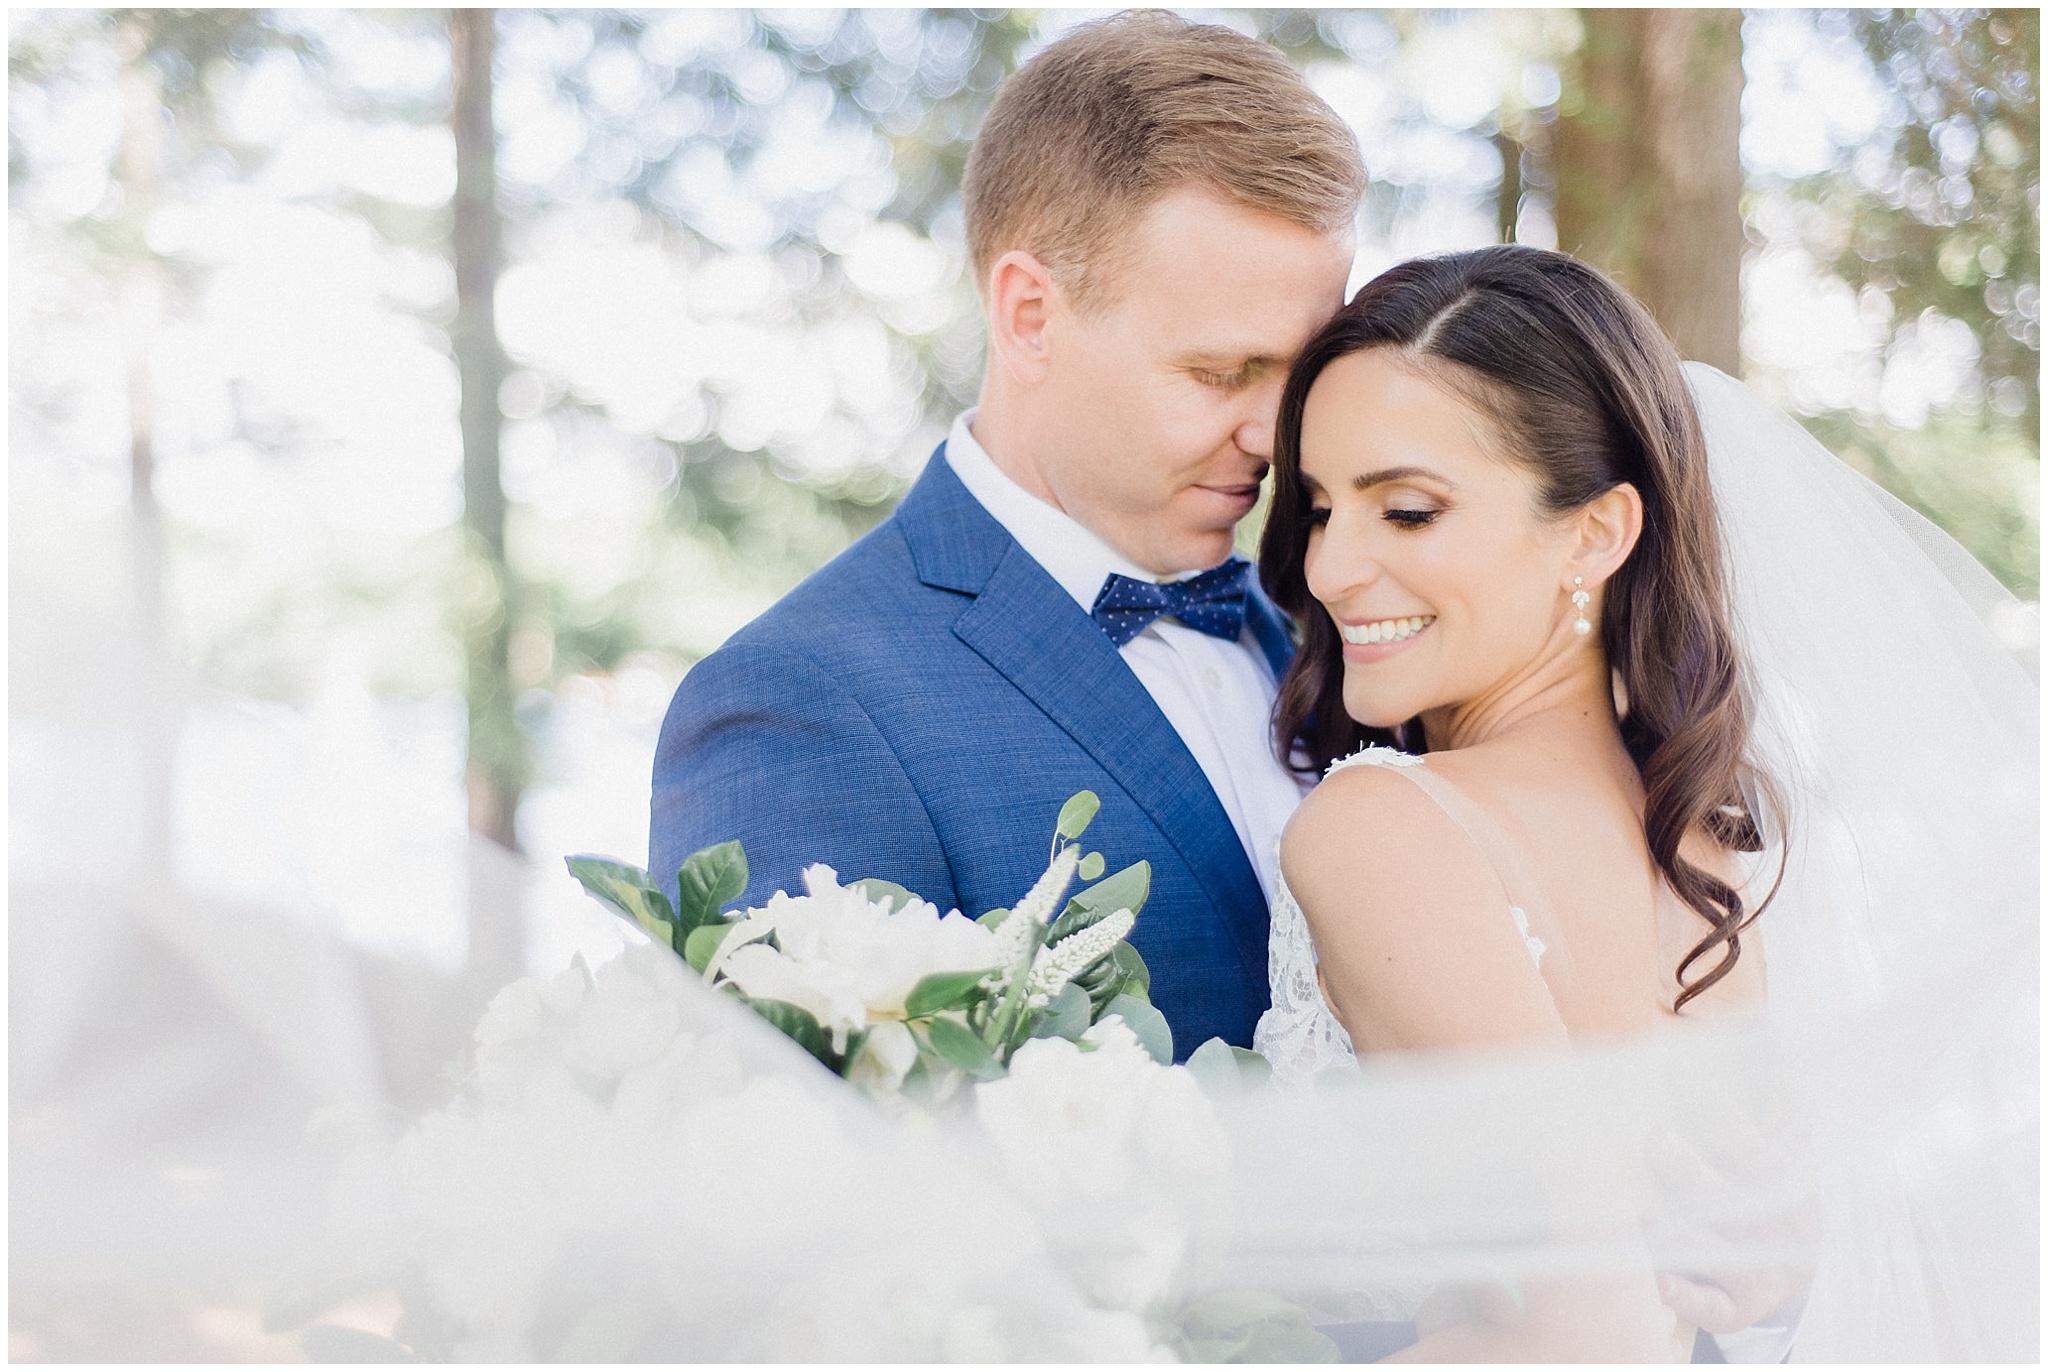 Elegant Muskoka wedding by Jenn Kavanagh Photography